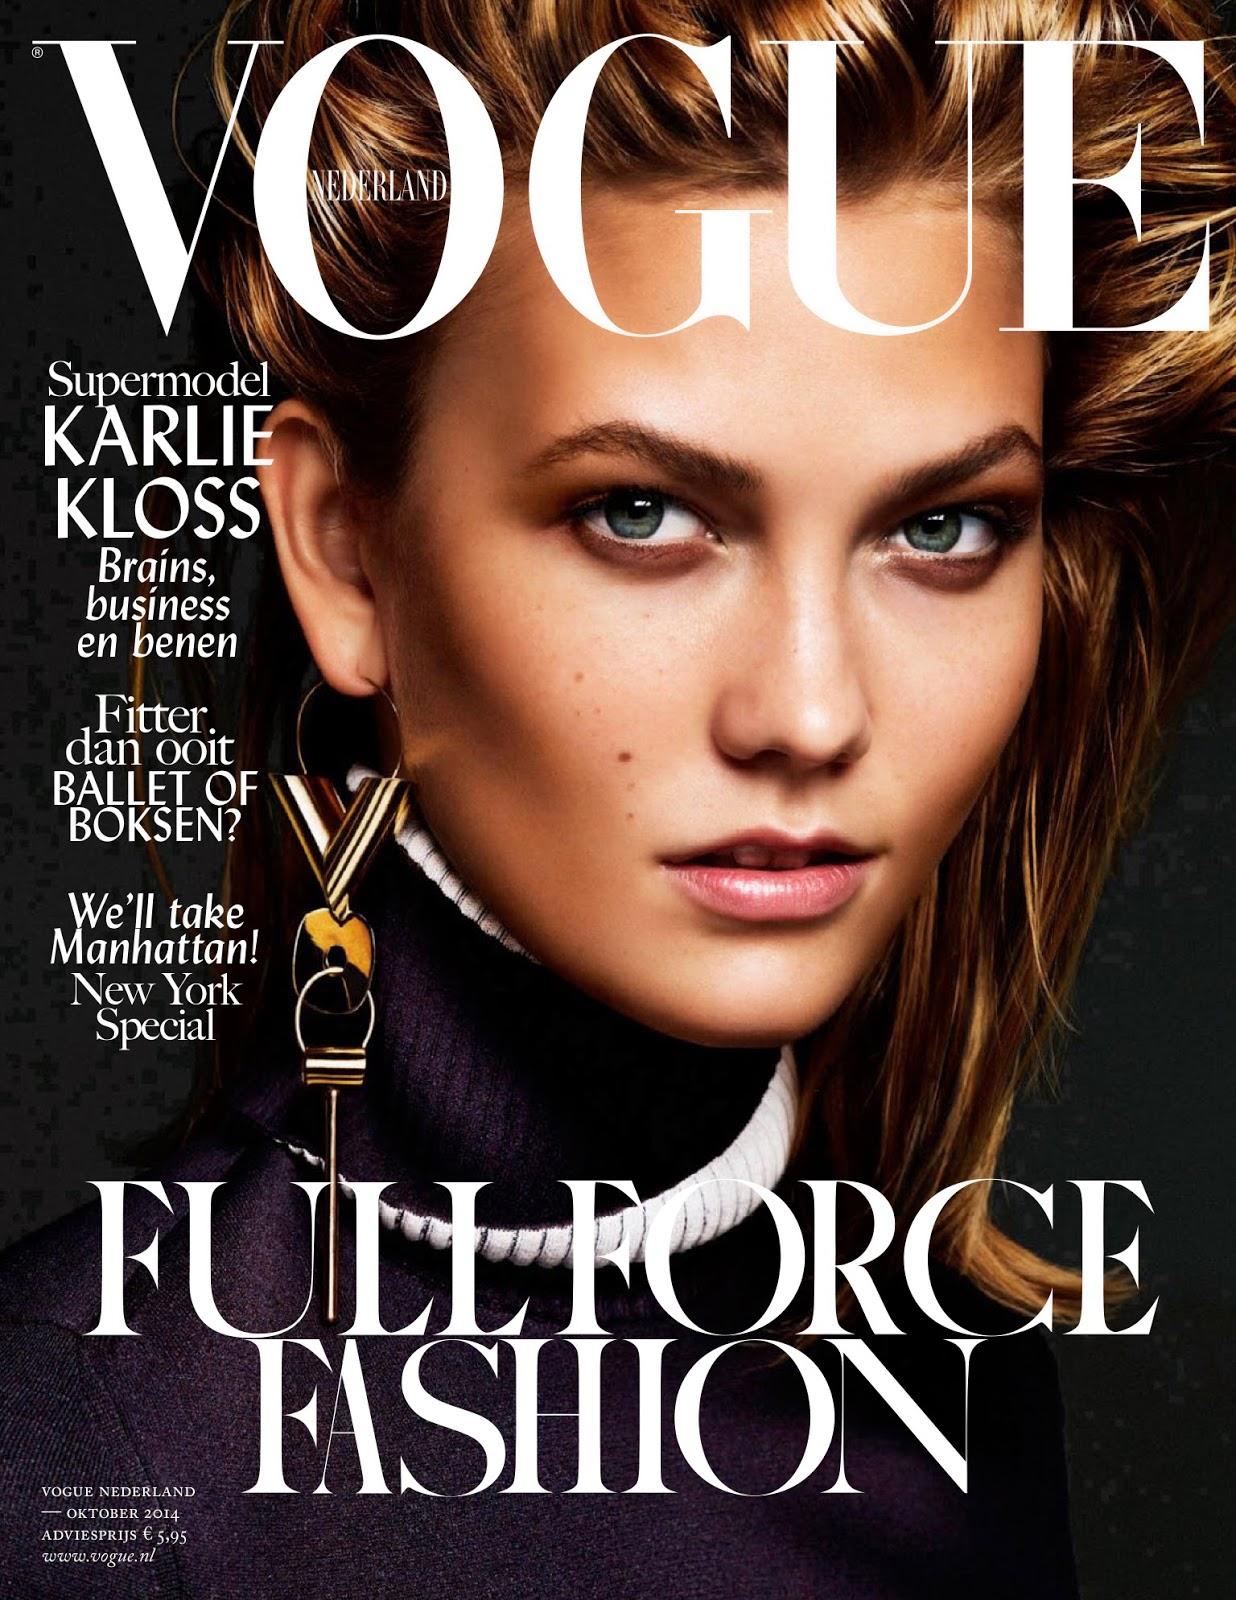 Karlie kloss vogue russia october 2017